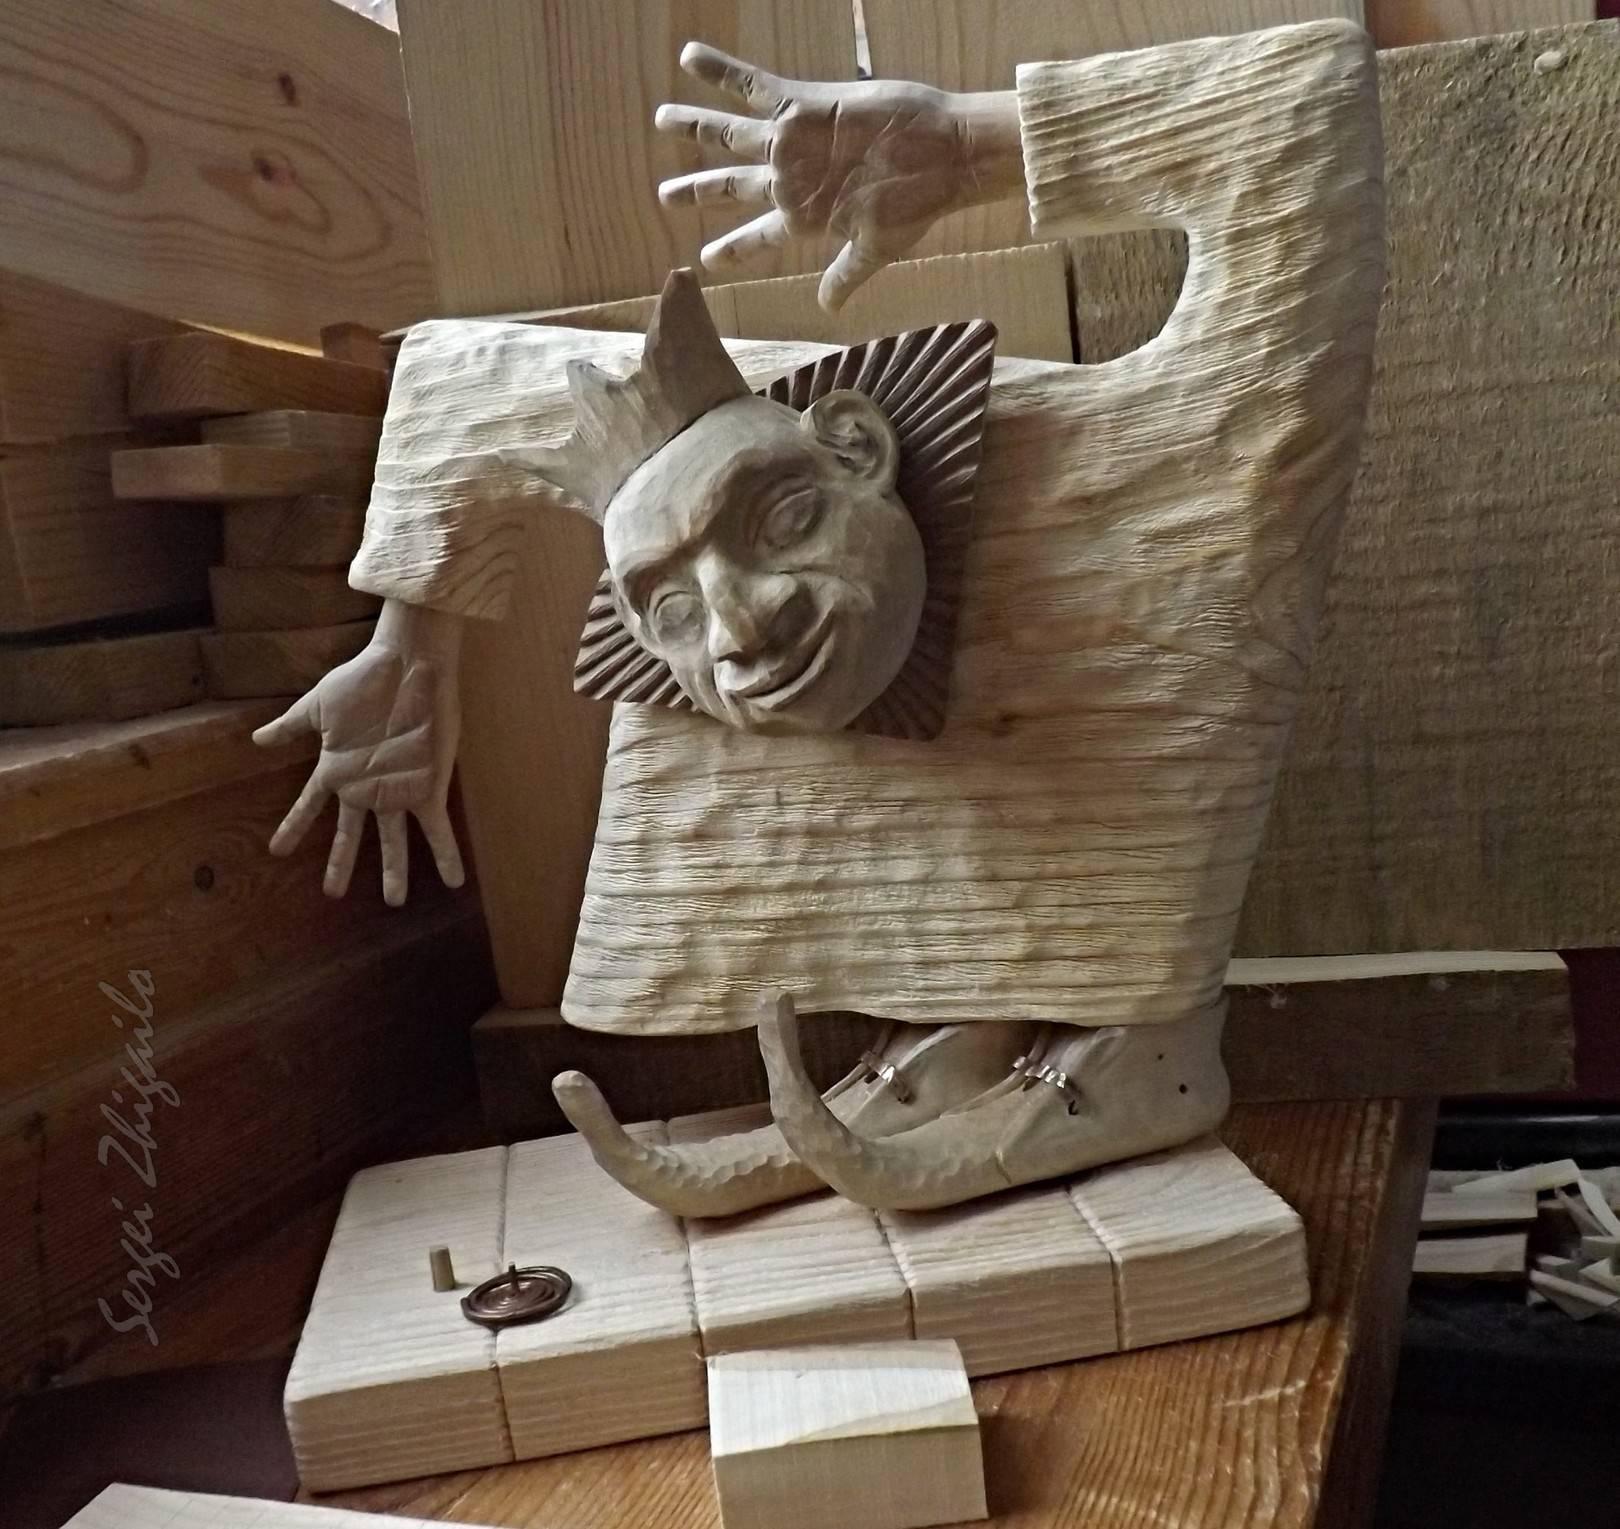 "Wooden sculpture ""DANSING KING"" in progress. Material - wood.  Скульптура из дерева ""ТАНЦУЮЩИЙ КОРОЛЬ"" - рабочий процесс. Материал - дерево."